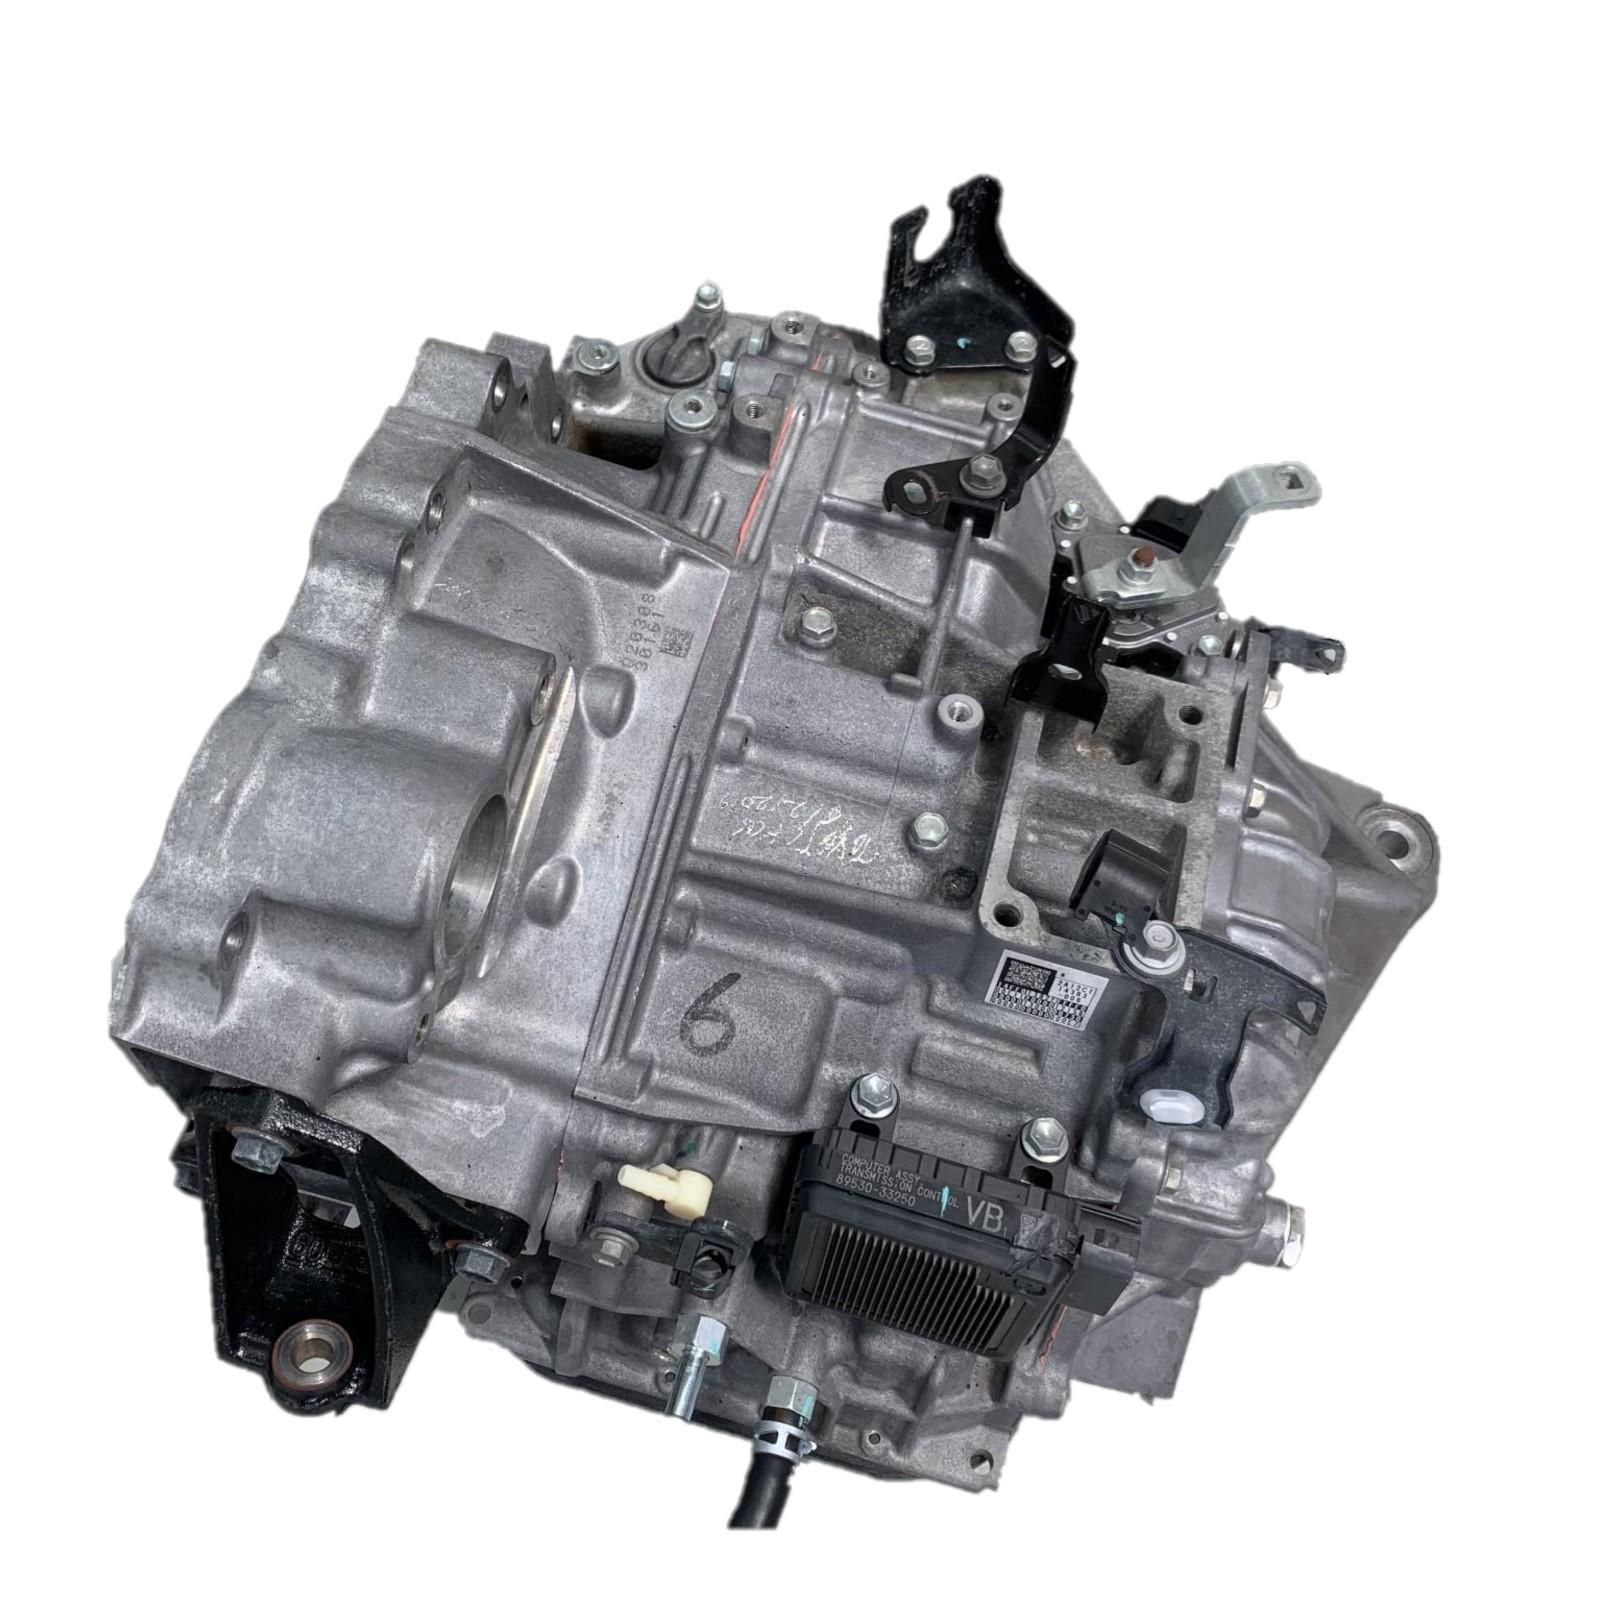 TOYOTA AURION, Trans/Gearbox, AUTO, 3.5 V6, 2GR-FE, 6 SPEED, GSV40R, 10/06-03/12